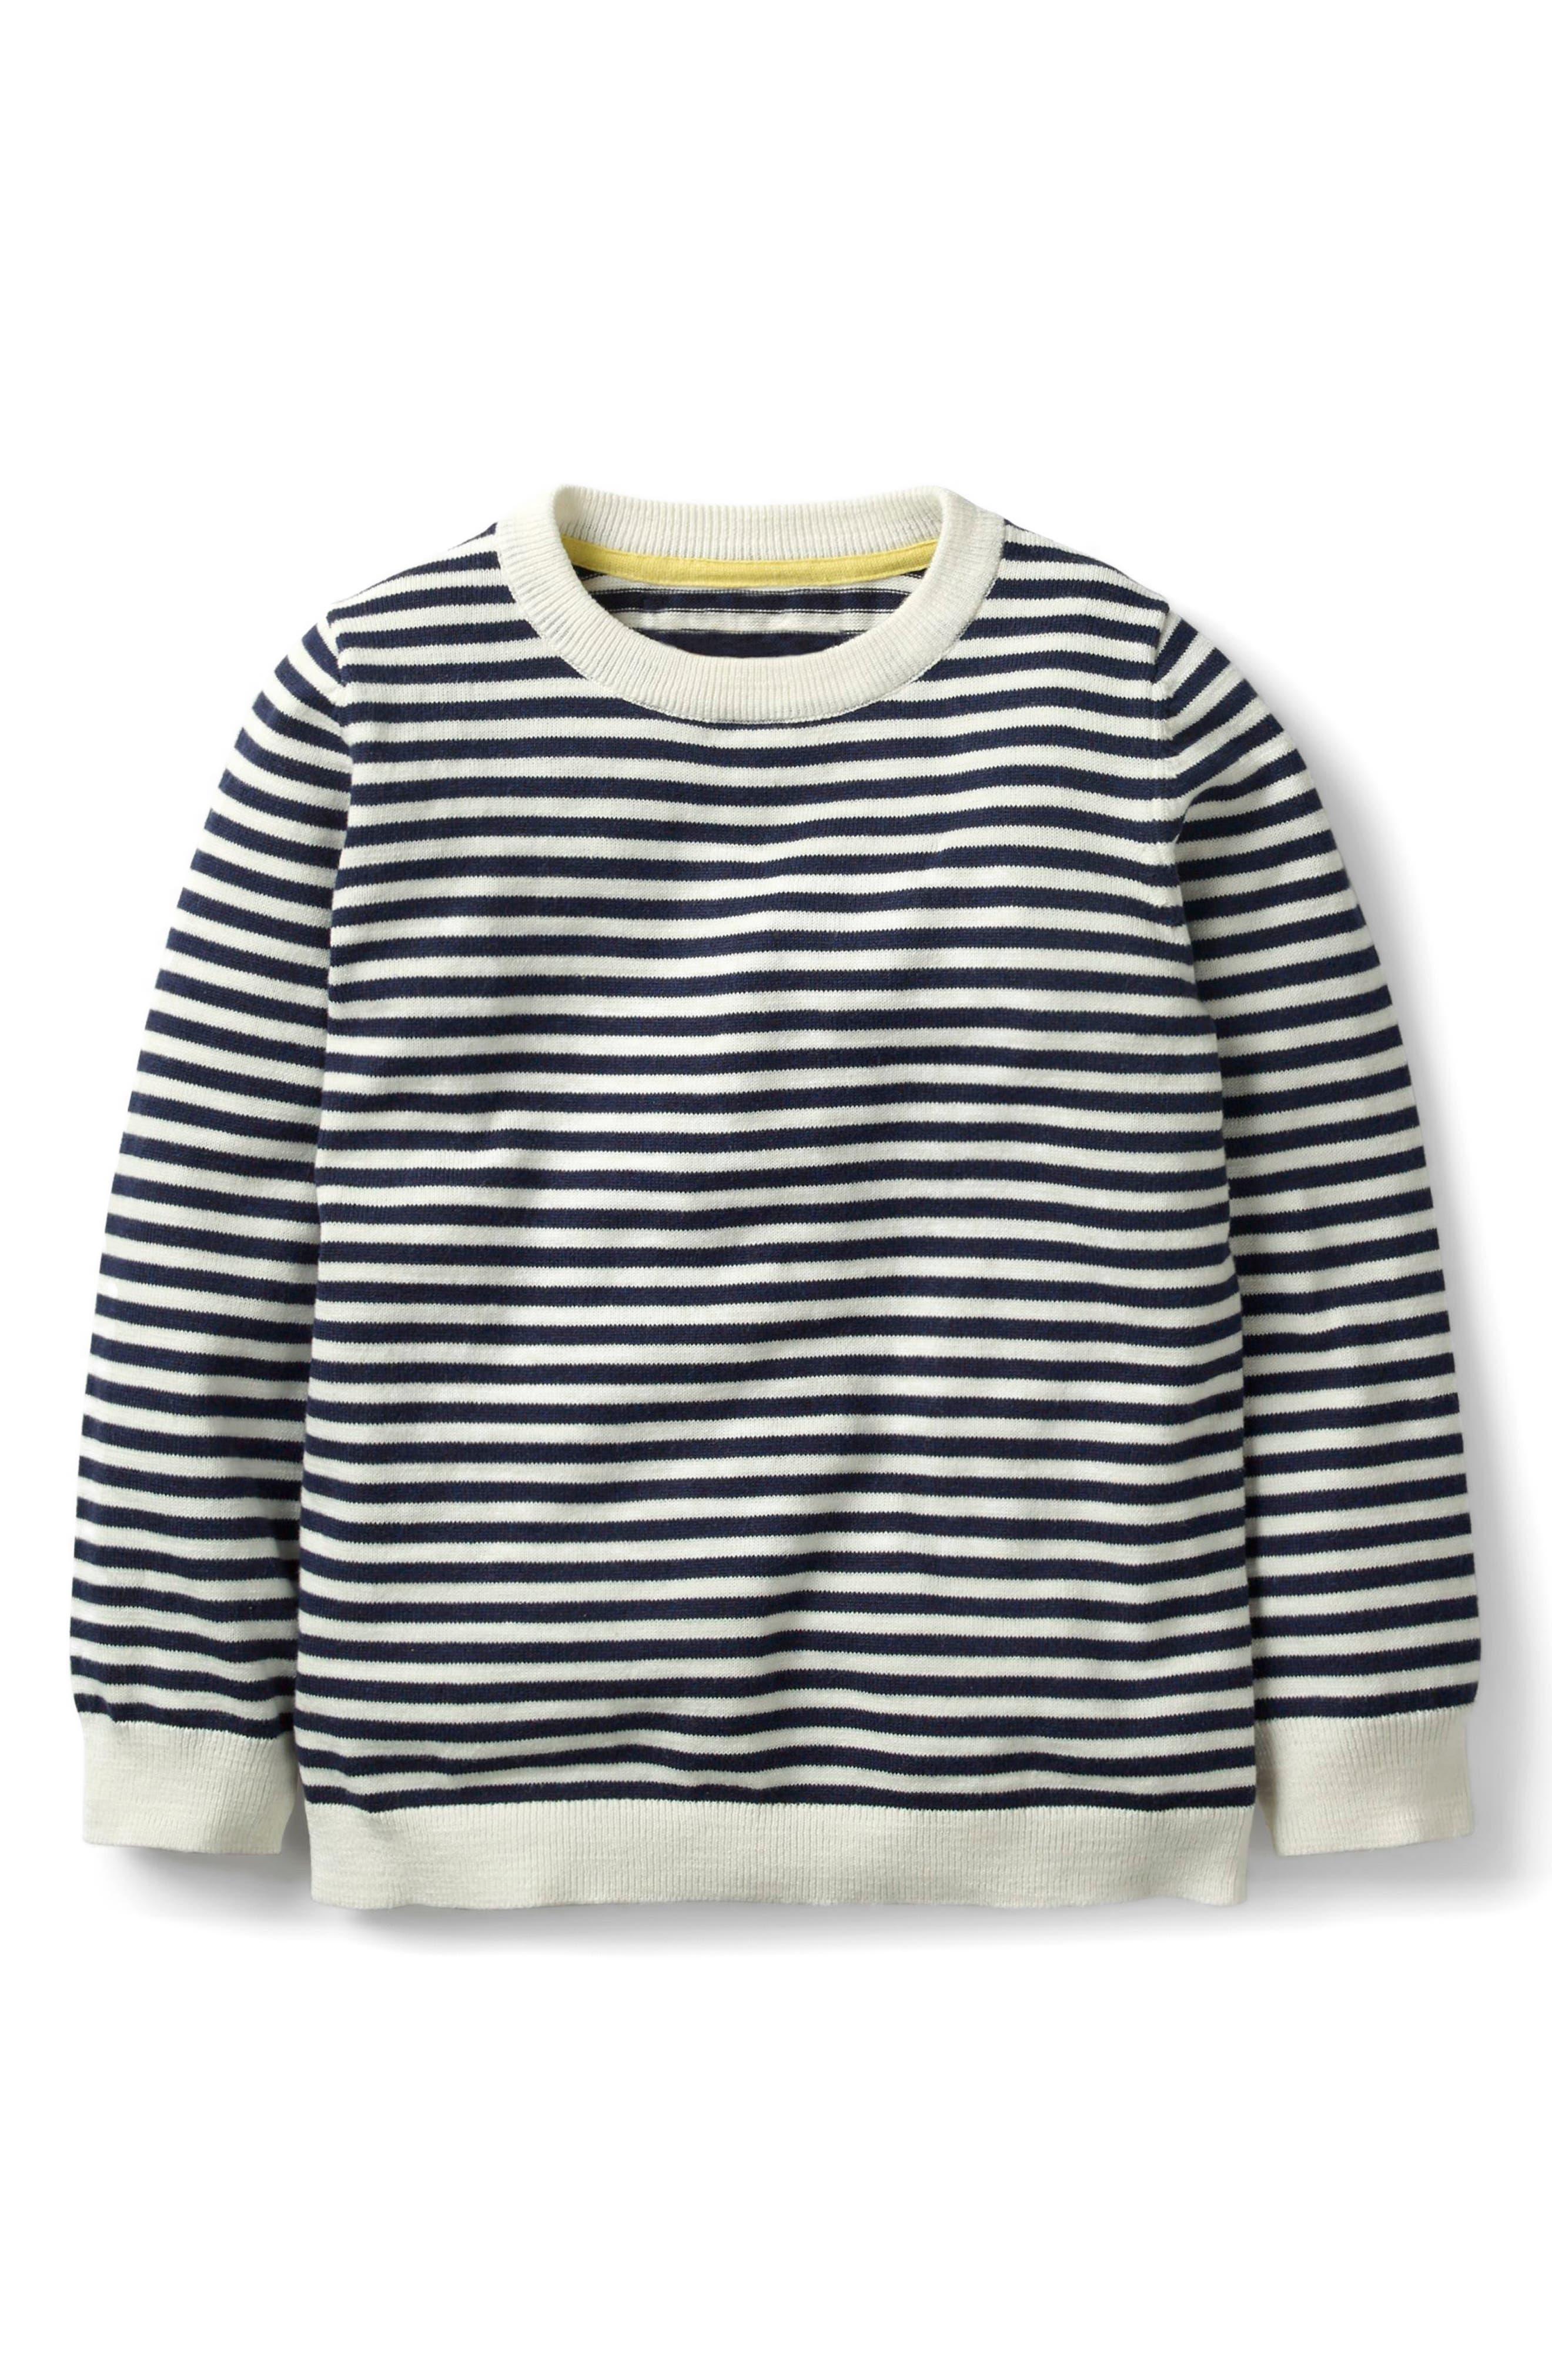 Main Image - Mini Boden Cotton & Cashmere Sweater (Toddler Boys, Little Boys & Big Boys)